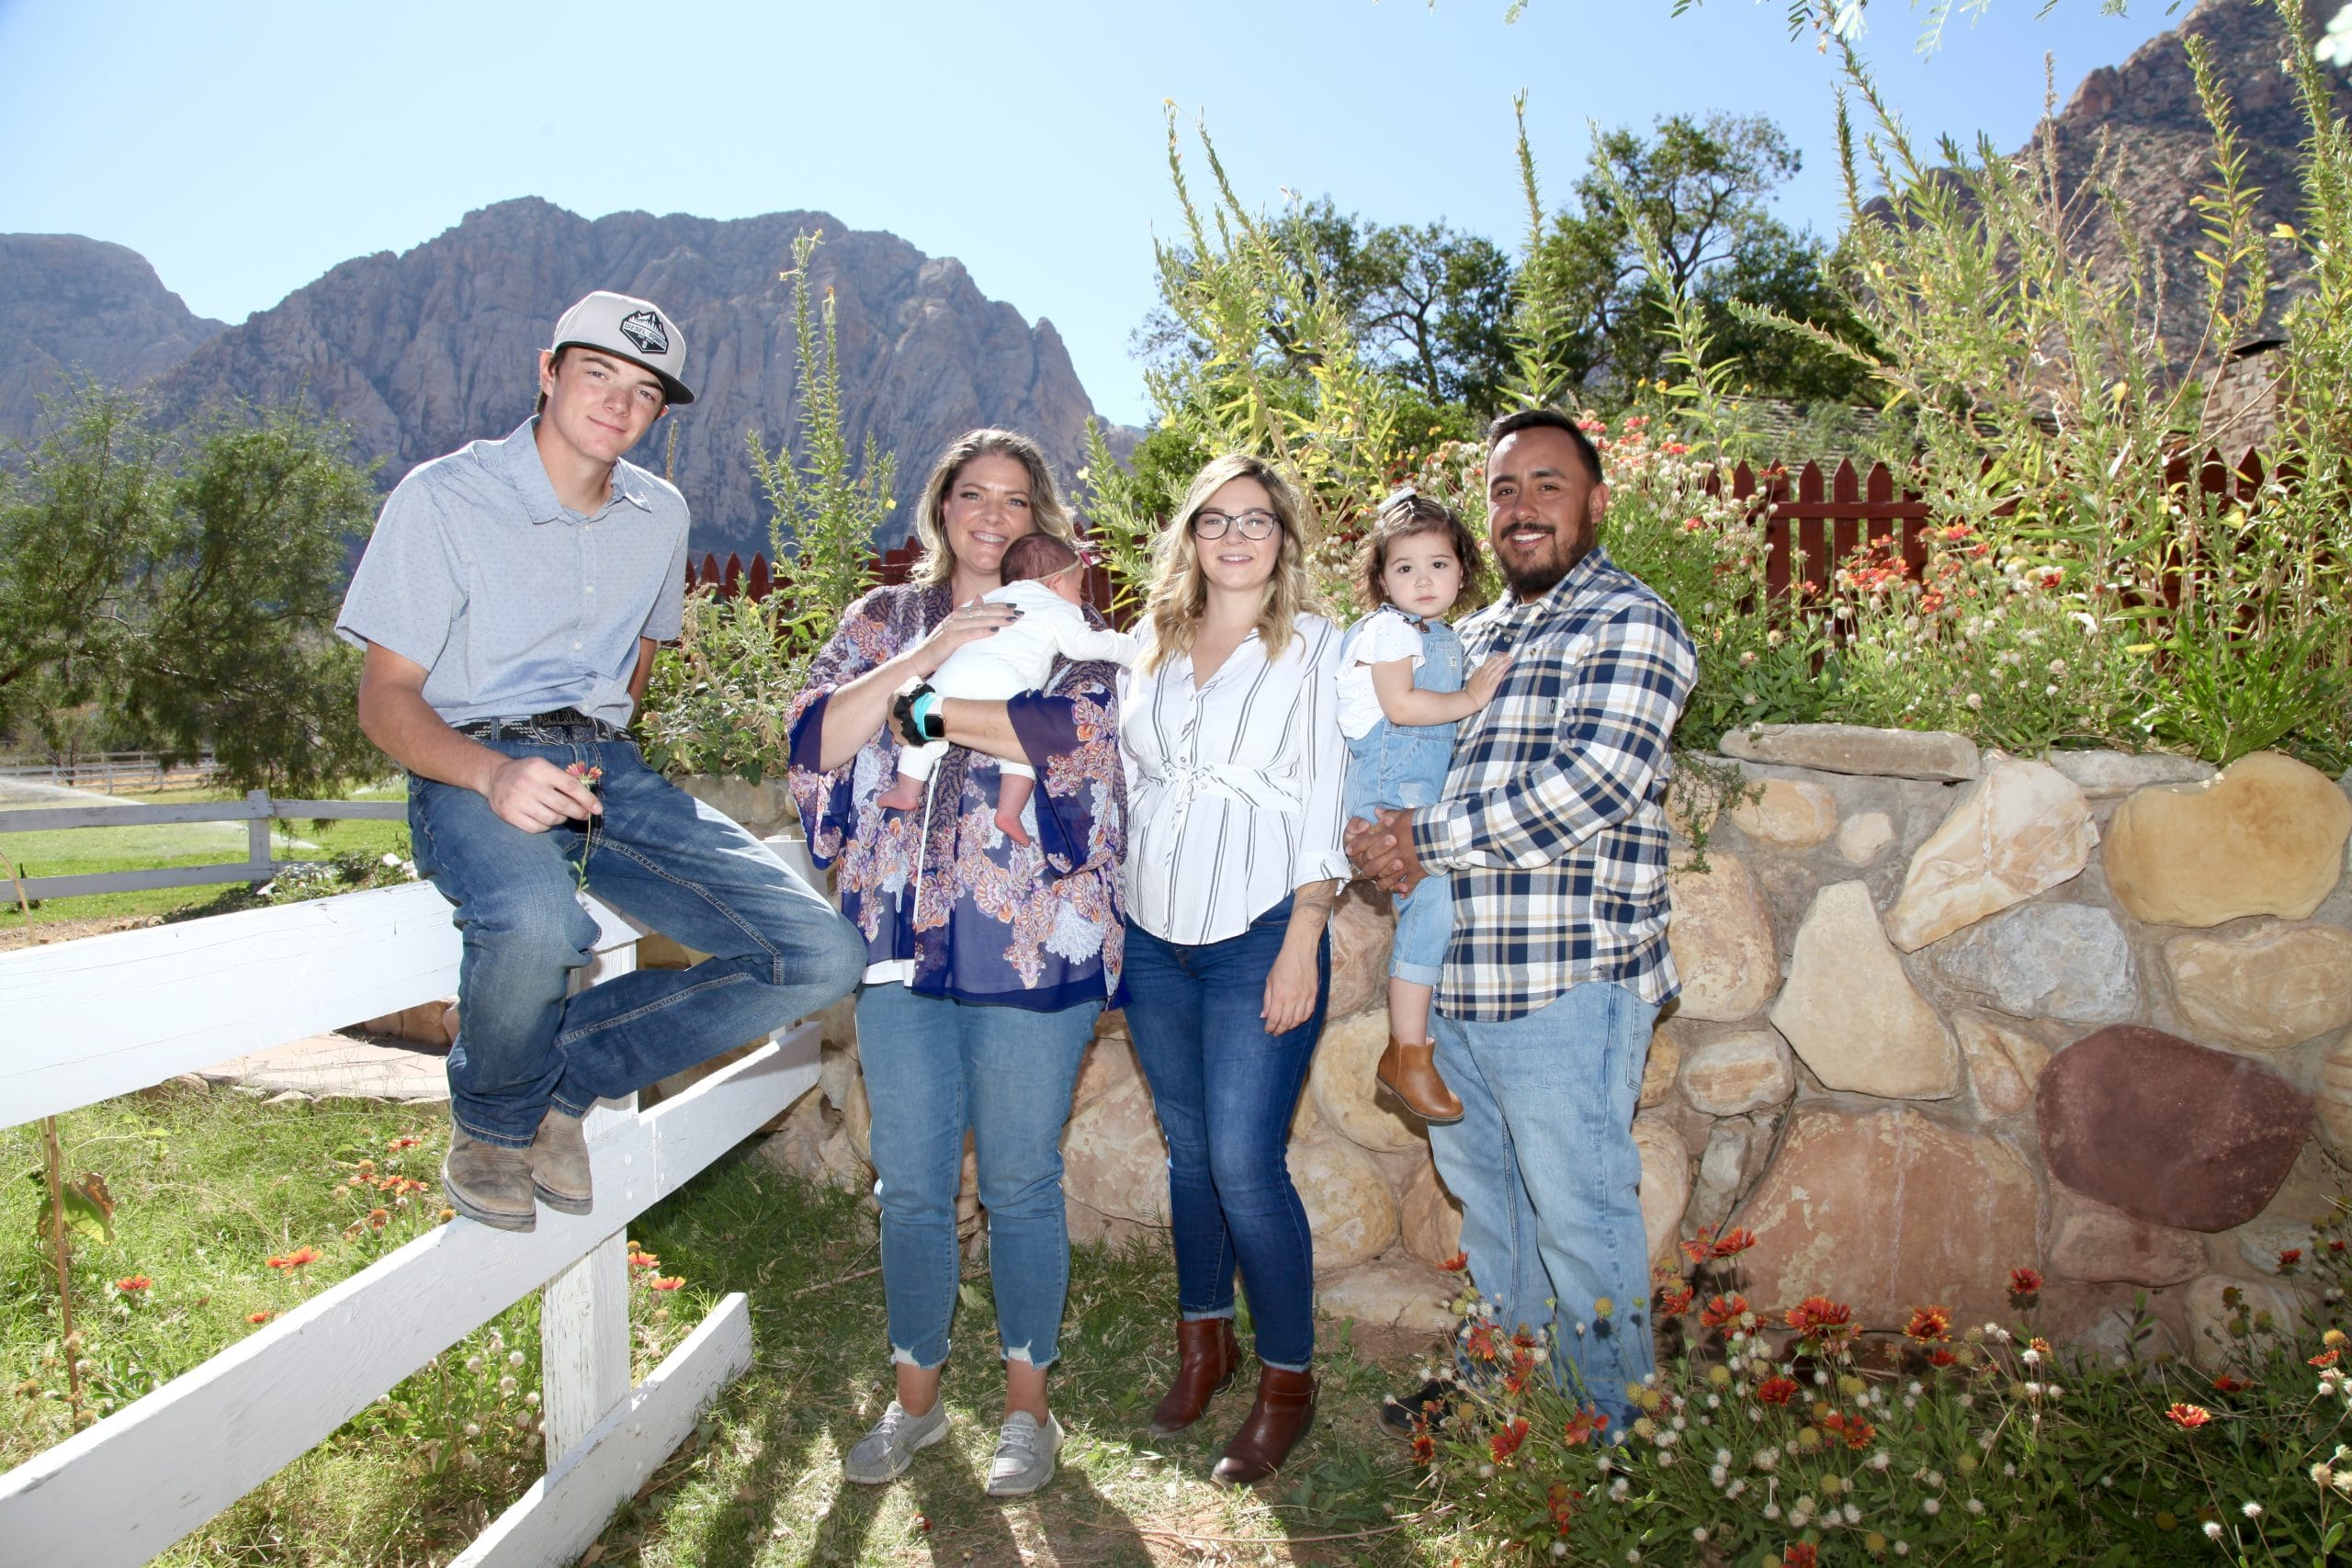 Jenn and her family